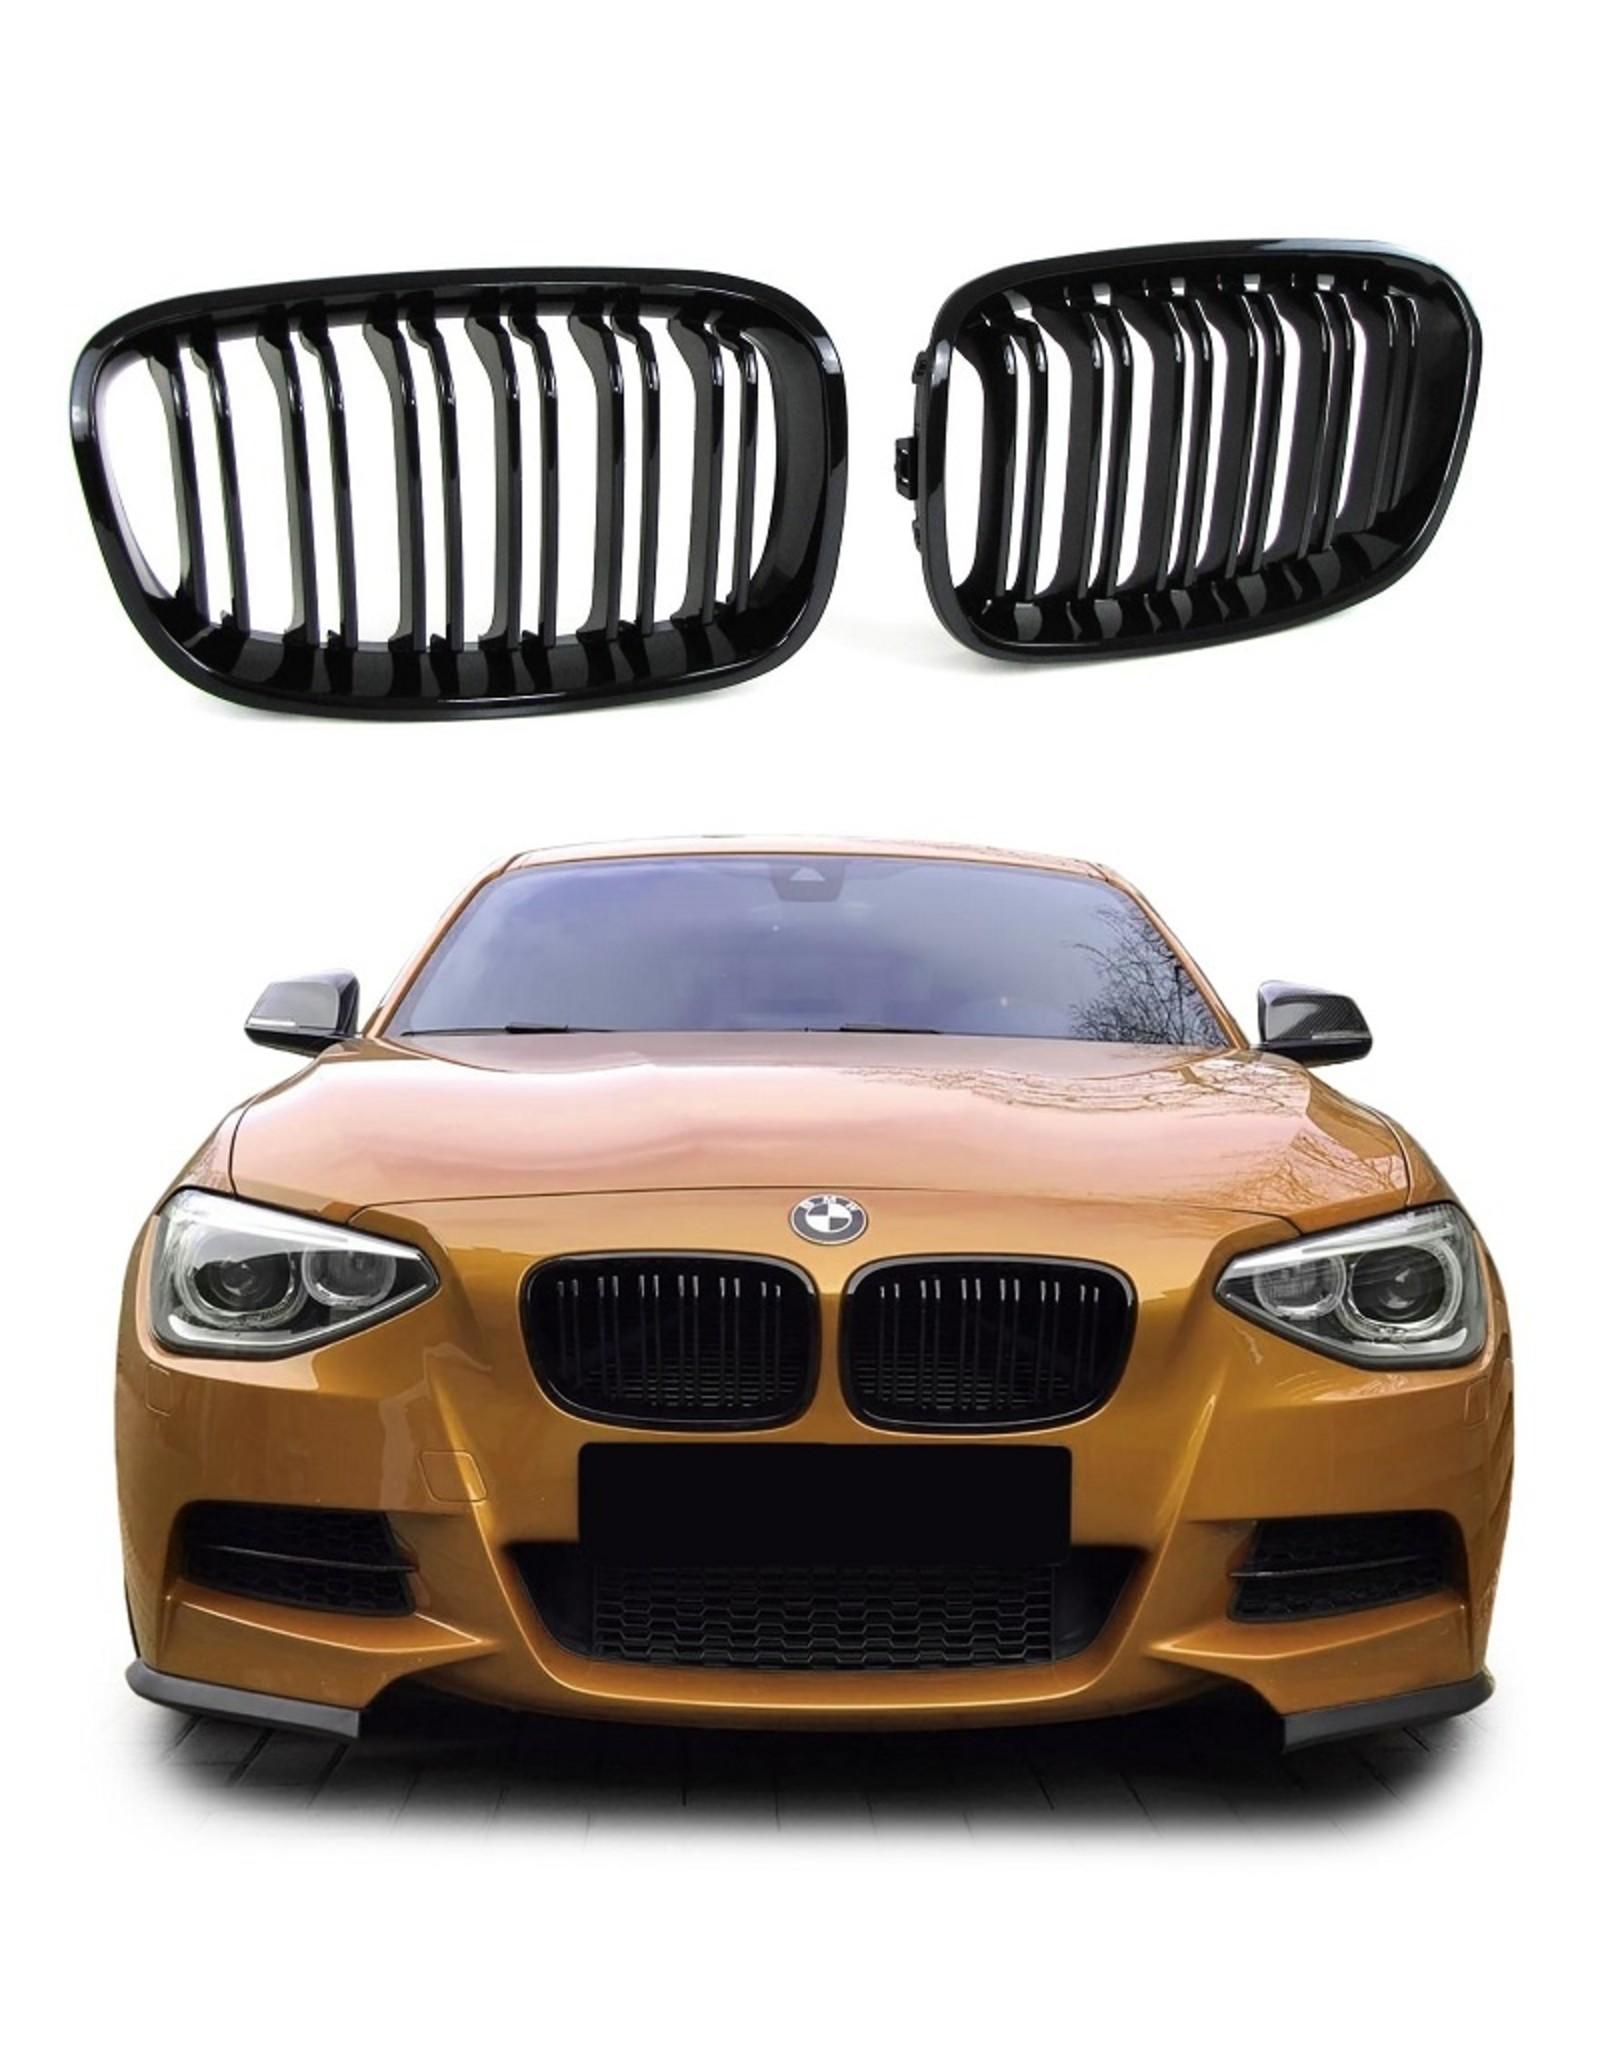 Grille glossy zwart voor BMW 1 serie F20 F21